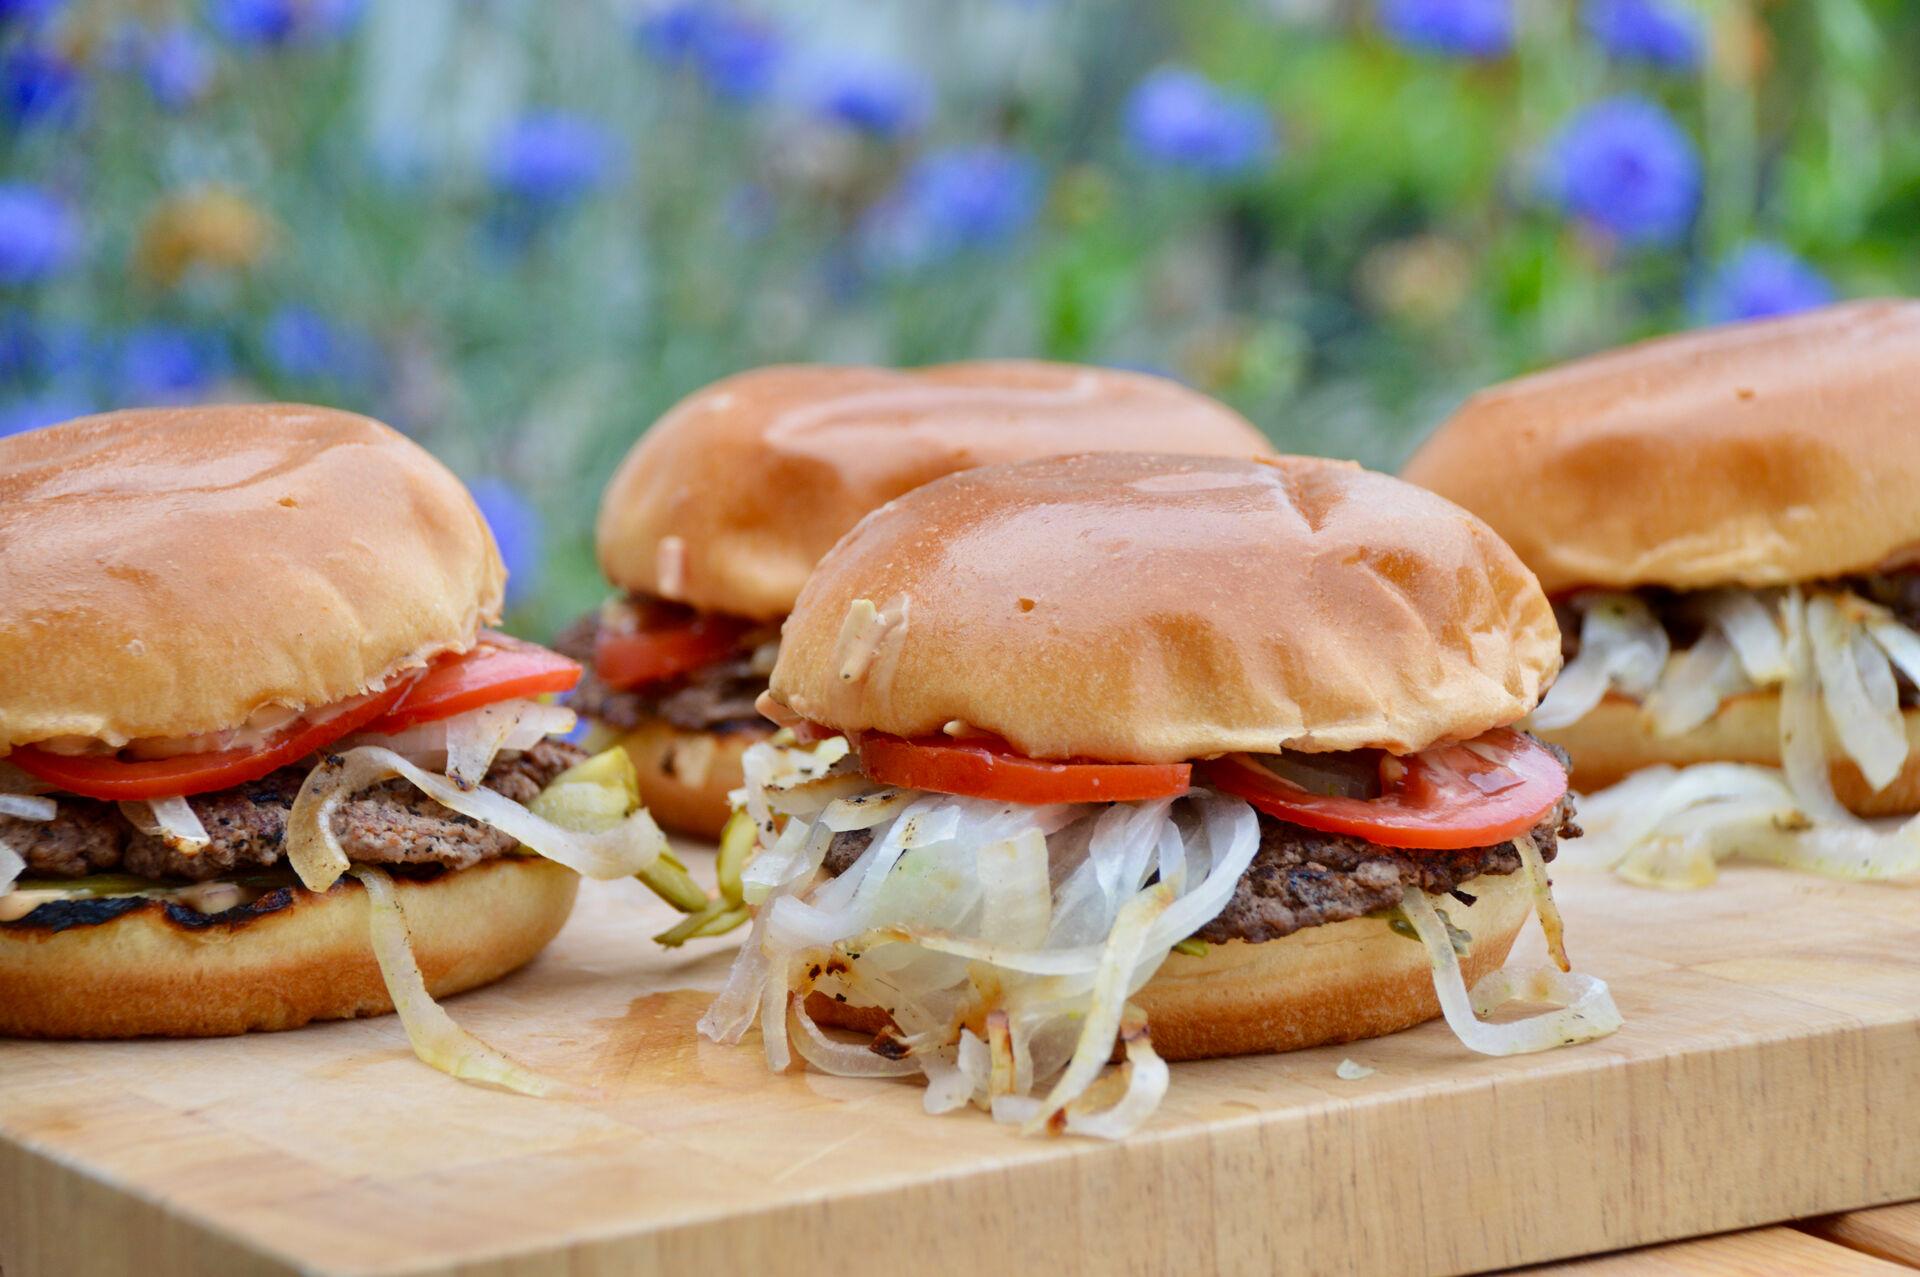 Foodblog: Smashed Onion Burger